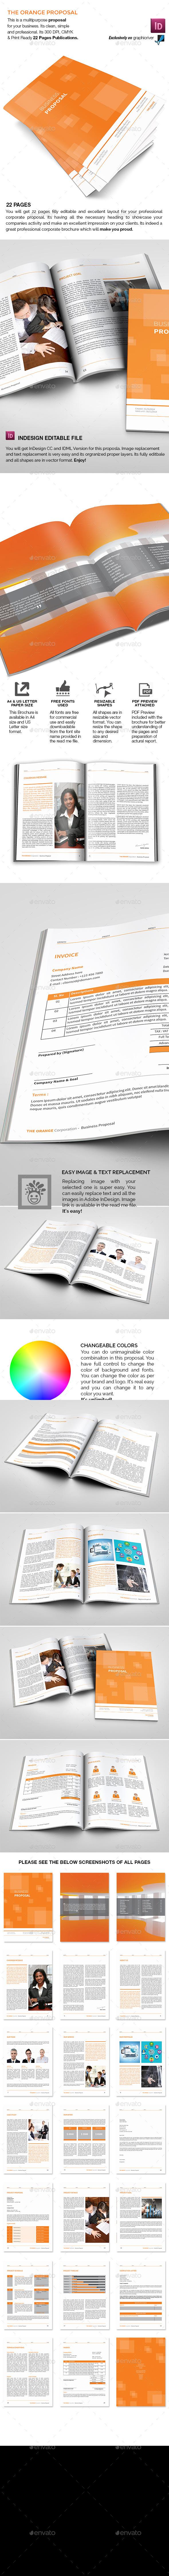 GraphicRiver The Simple Orange Proposal 9189581